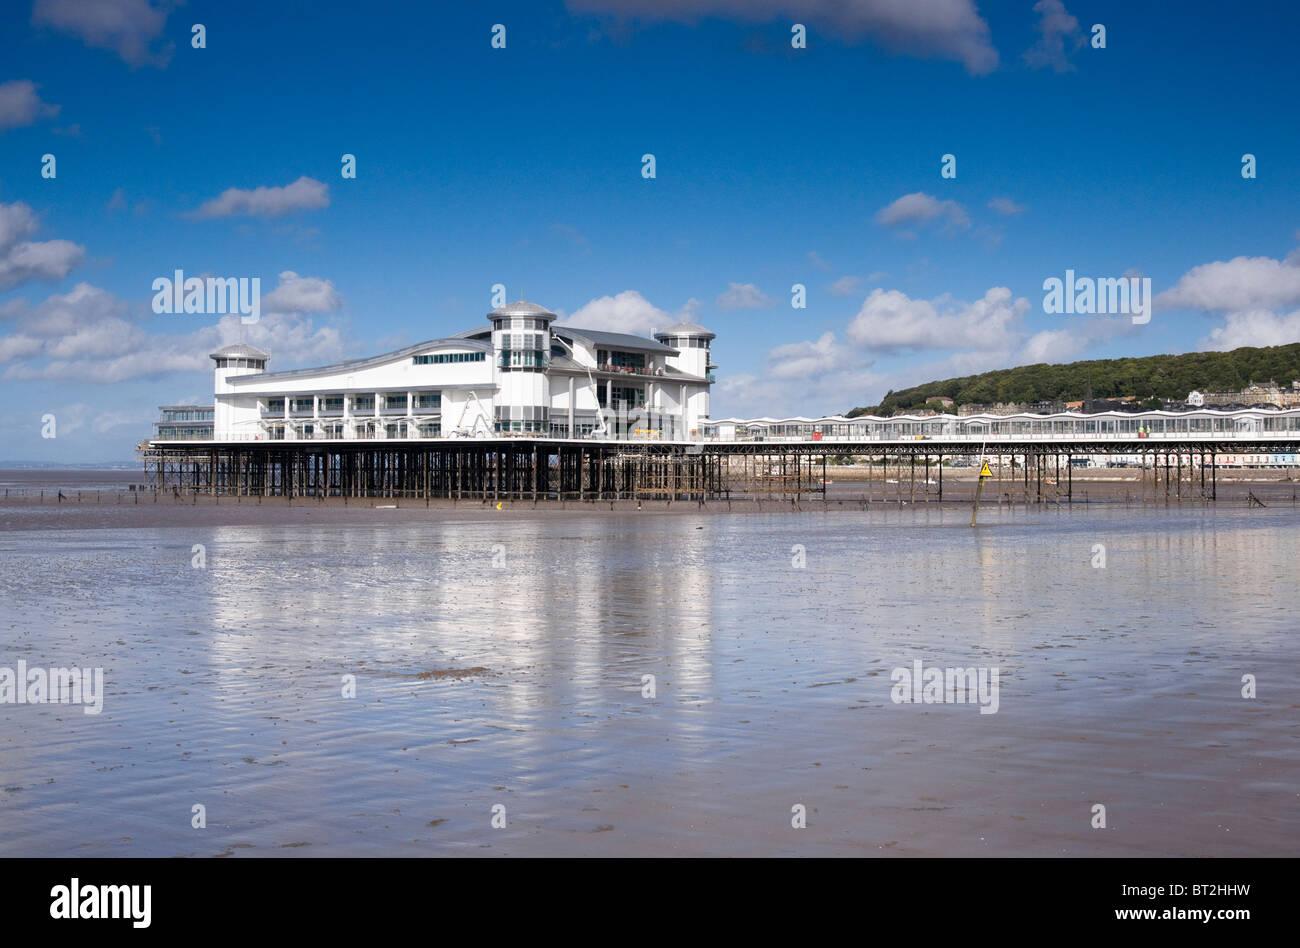 The new Pier Pavilion Weston super Mare - Stock Image